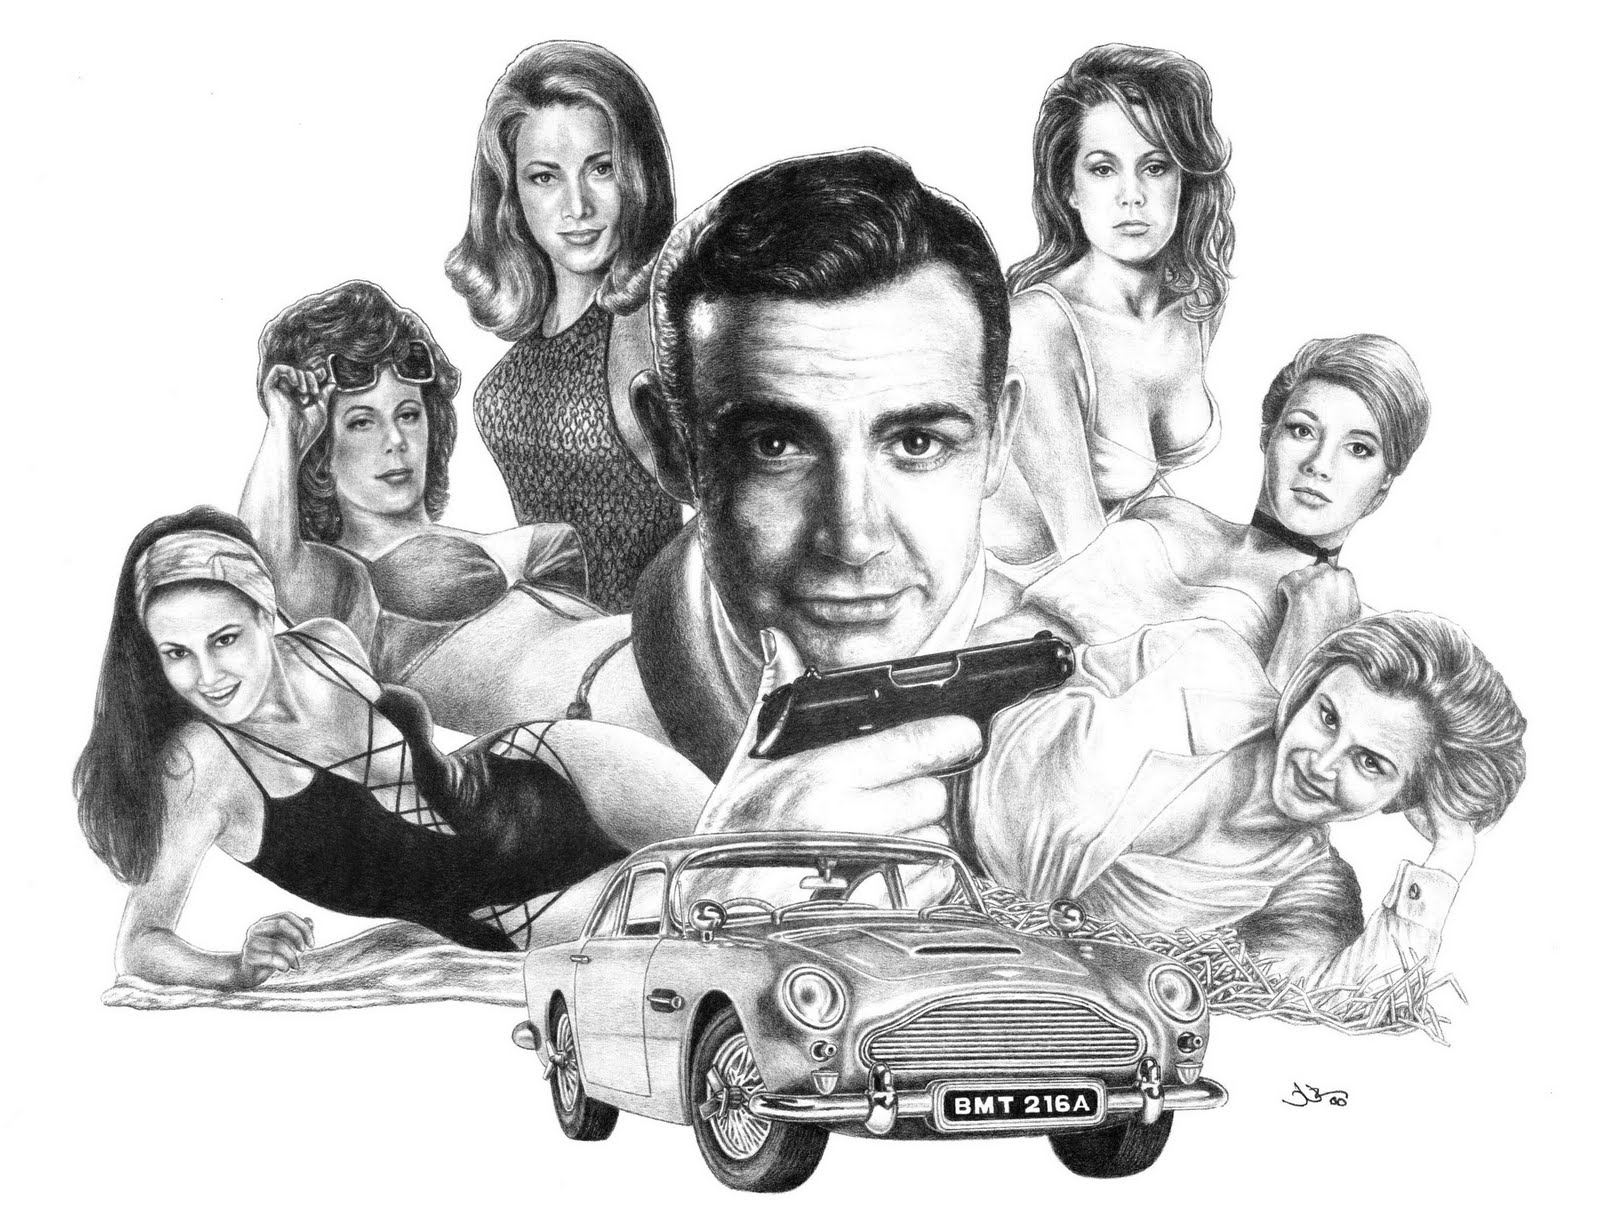 Best James Bond Scenes: Sean Connery Era